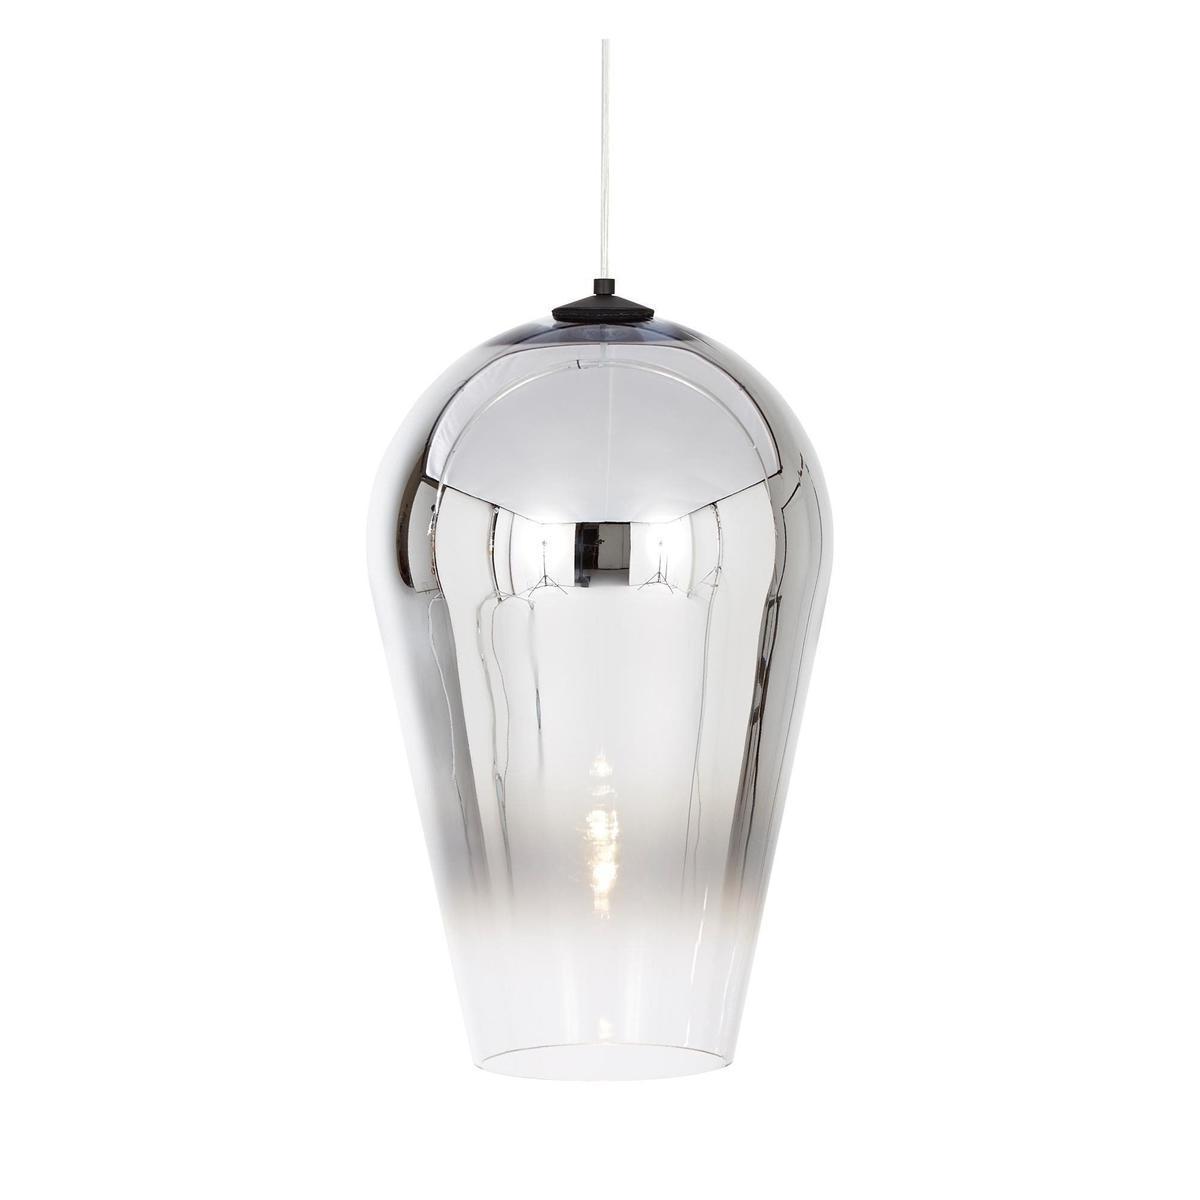 Подвесной светильник Loft IT Fade Pendant Light Loft2022-B aistarry e27 edison vintage light loft industrial retro droplight iron cage pendant light hanging lamp for cafe restaurant home